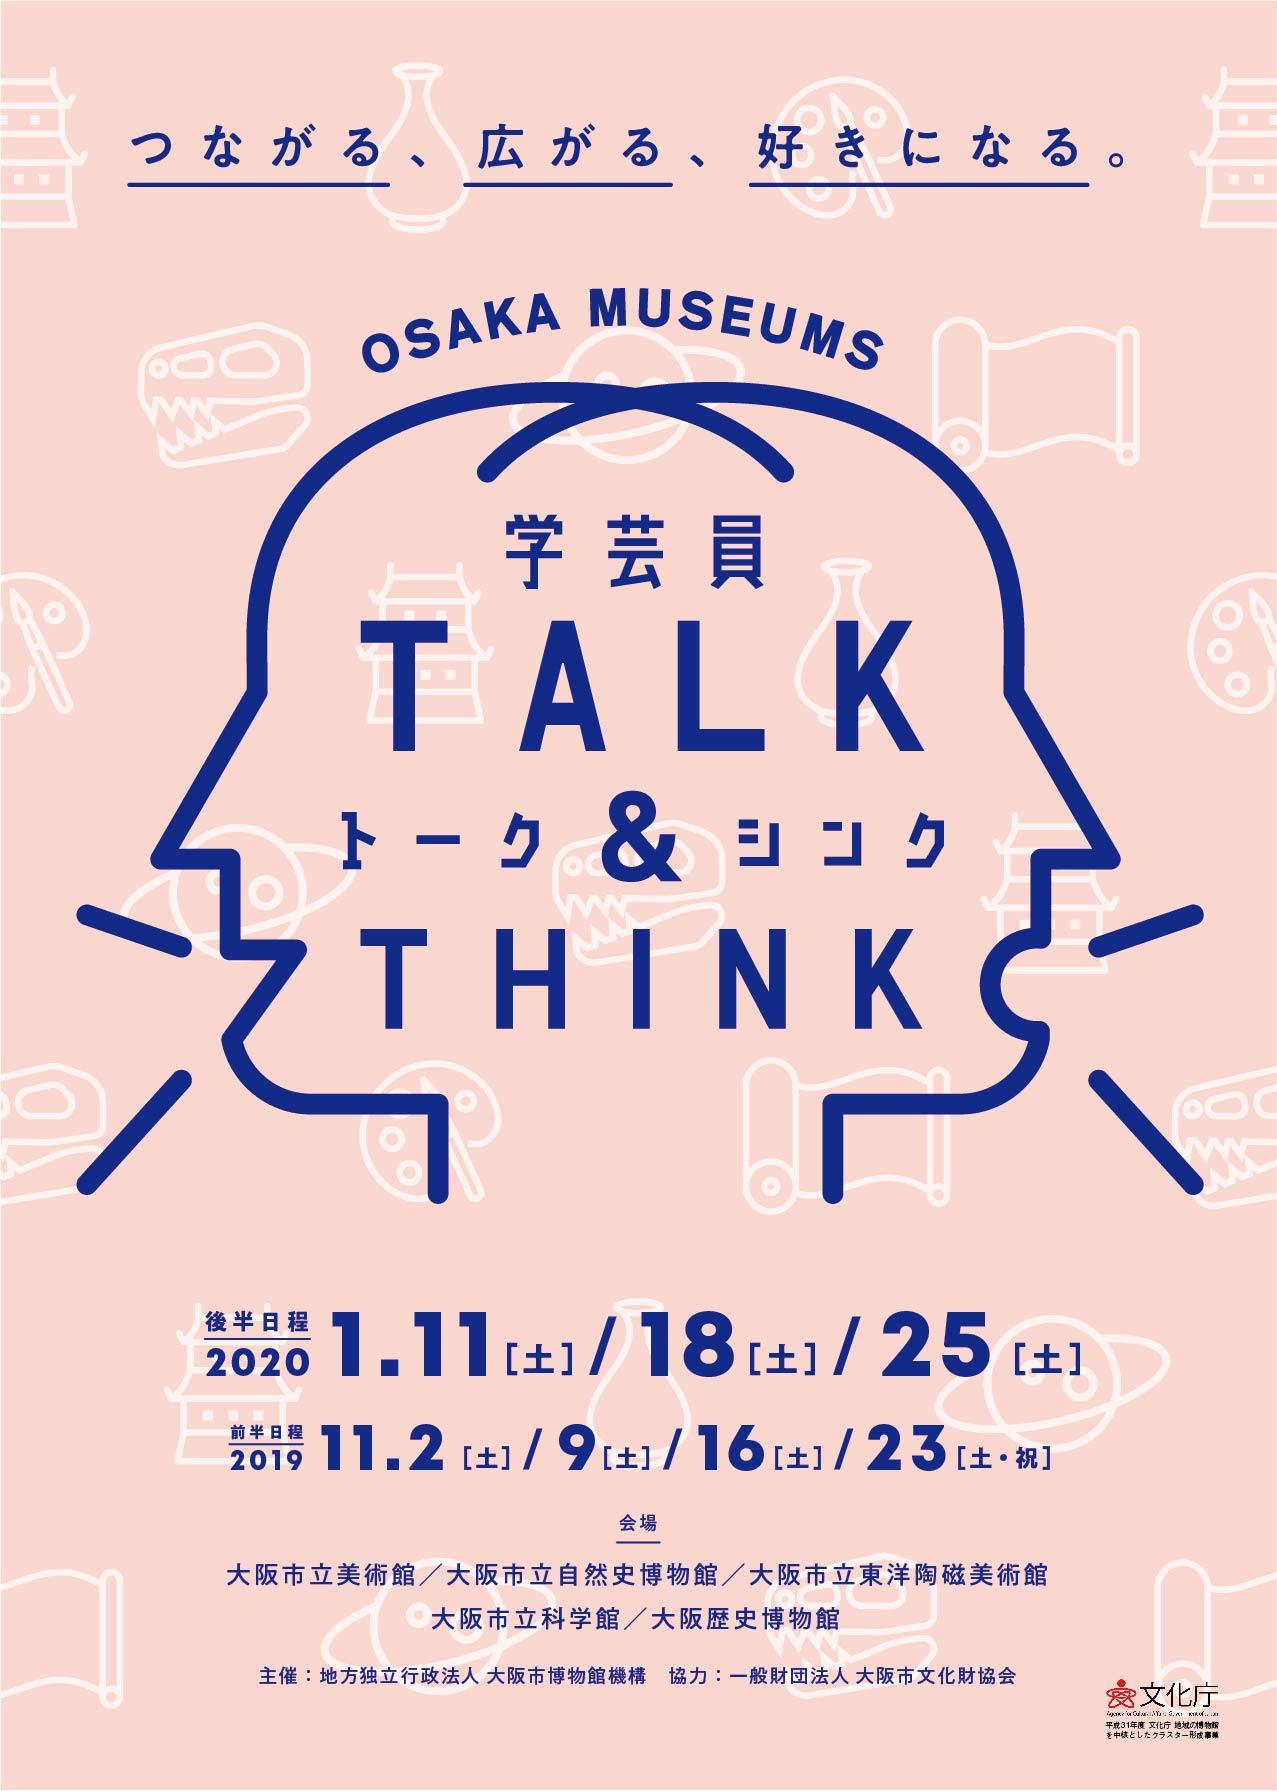 OSAKA MUSEUMS 学芸員 TALK & THINK